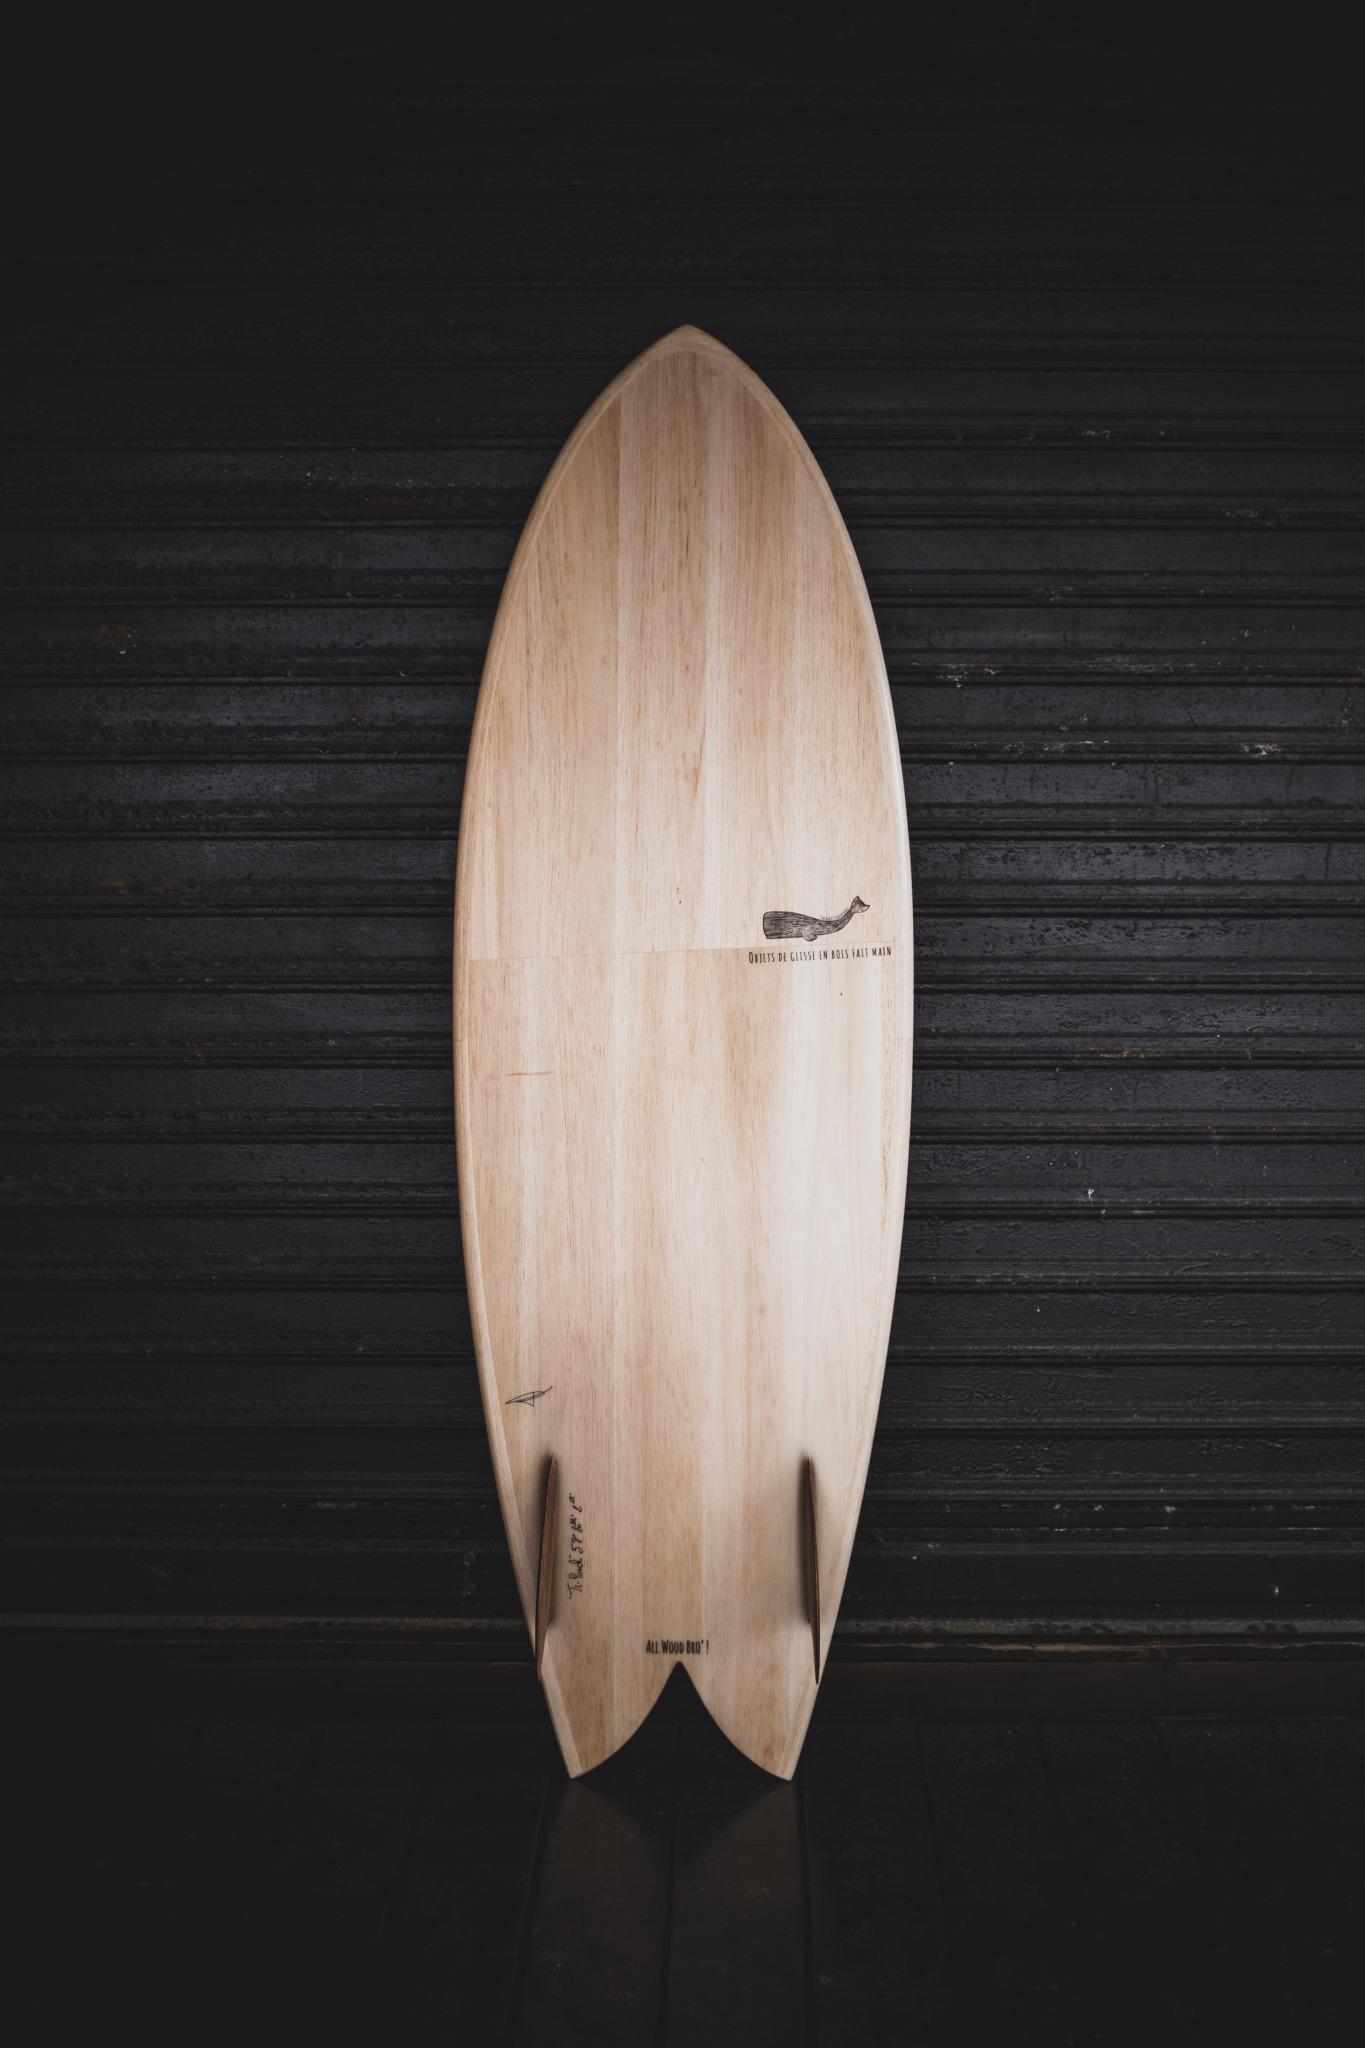 Cachalot surfboards planche surf bois wooden artisan shaper